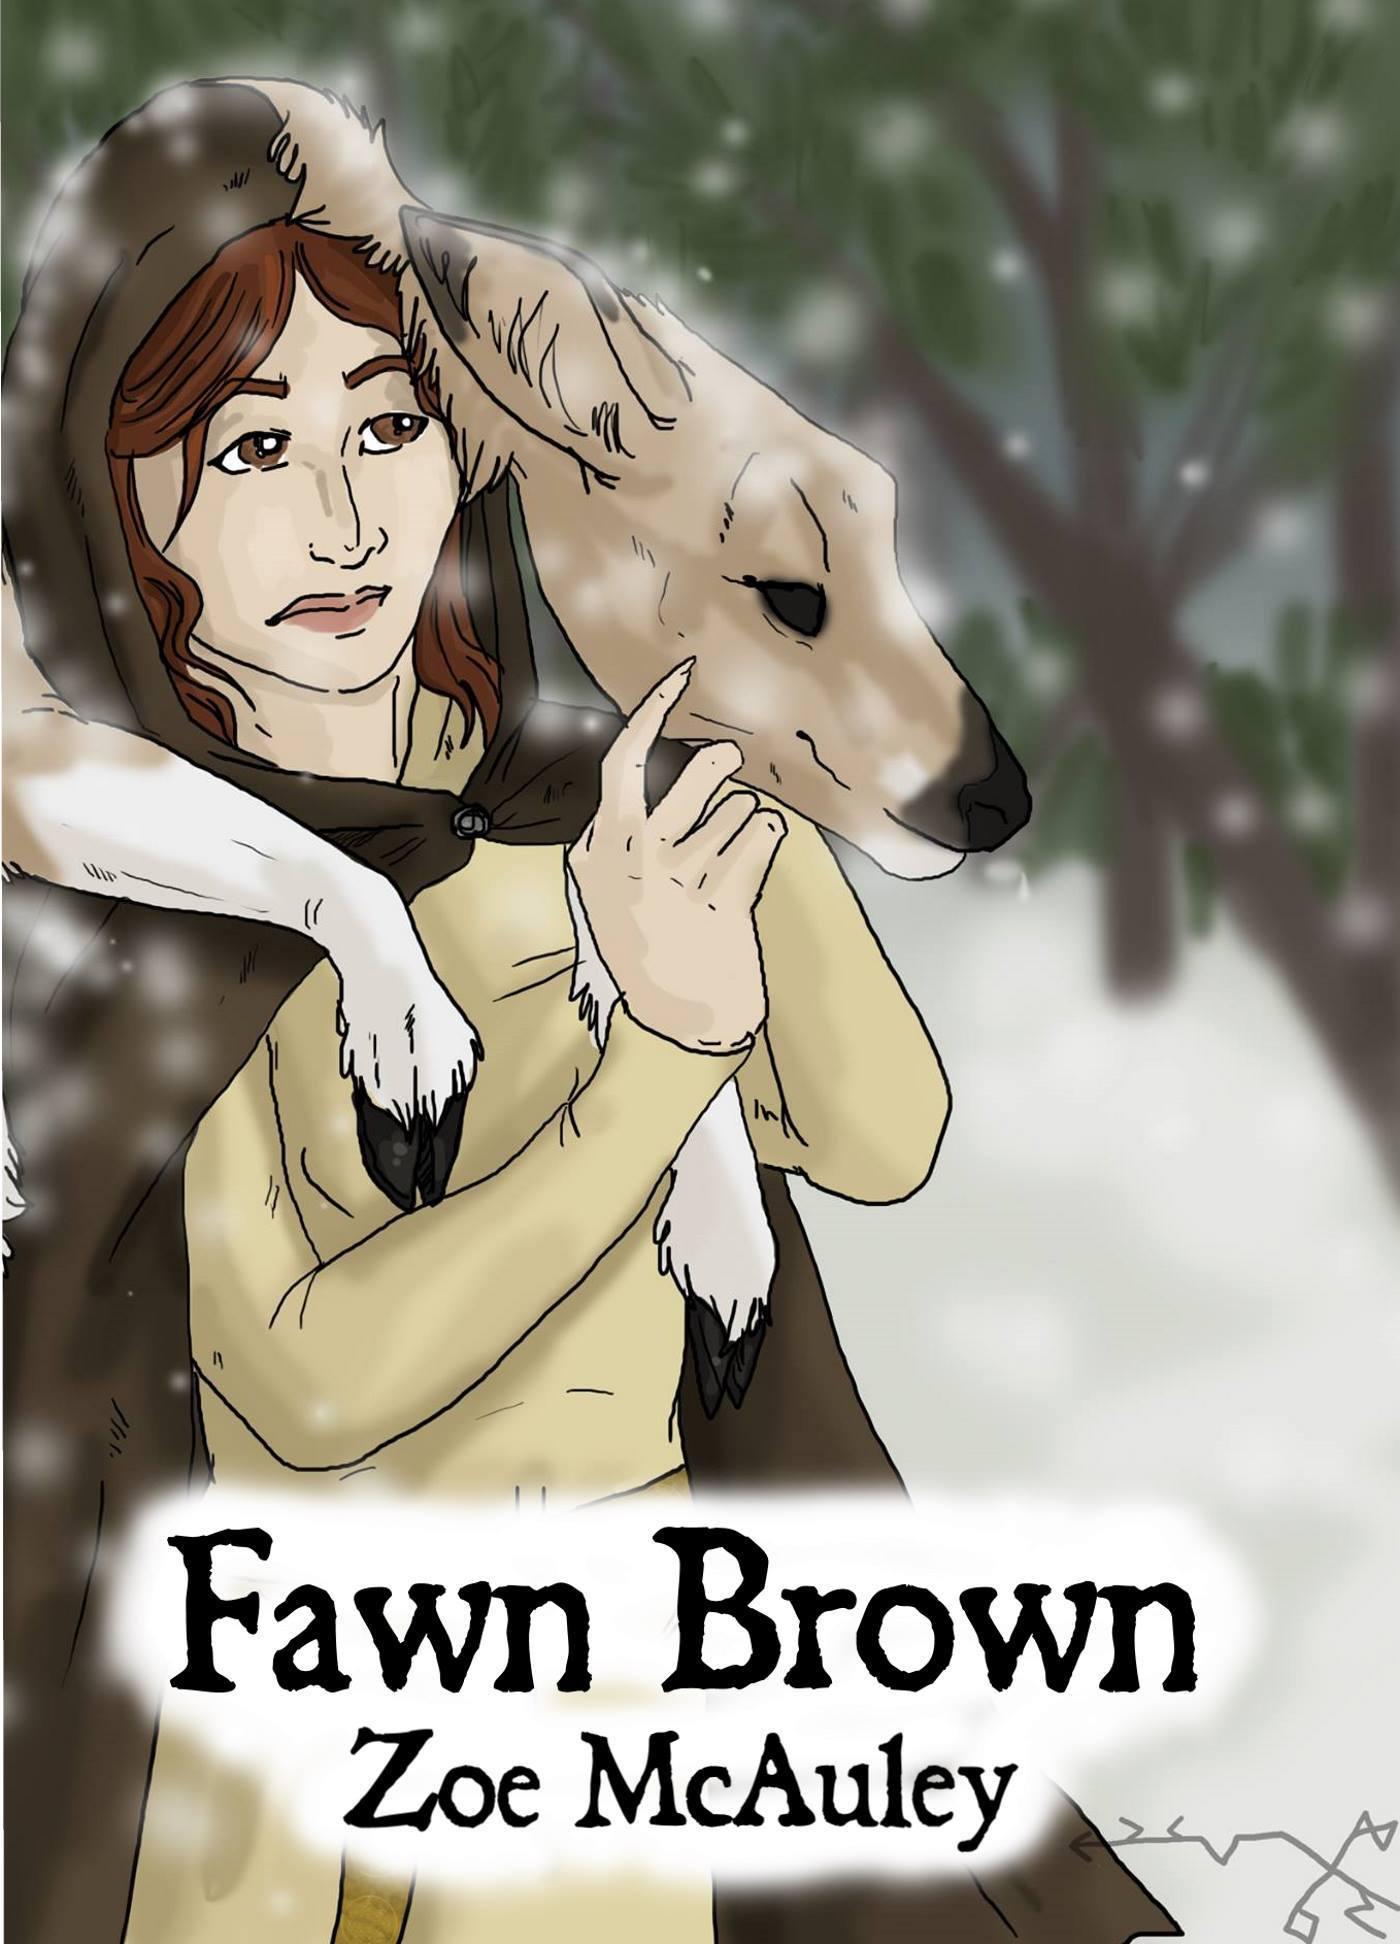 Fawn Brown Zoe McAuley